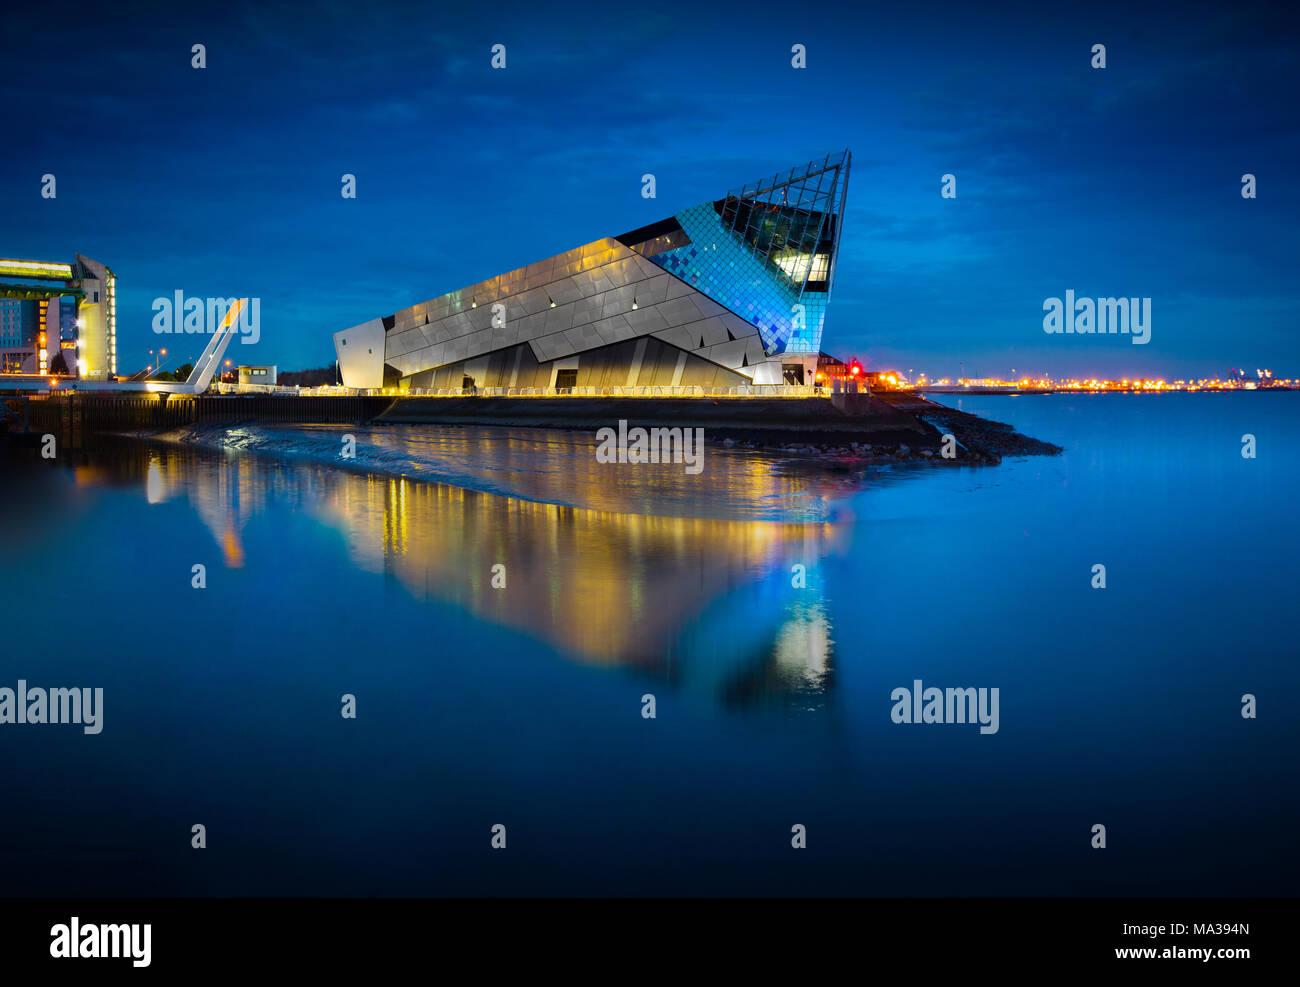 The Deep Aquarium, Hull, East Yorkshire, UK - 28th March 2018 Stock Photo